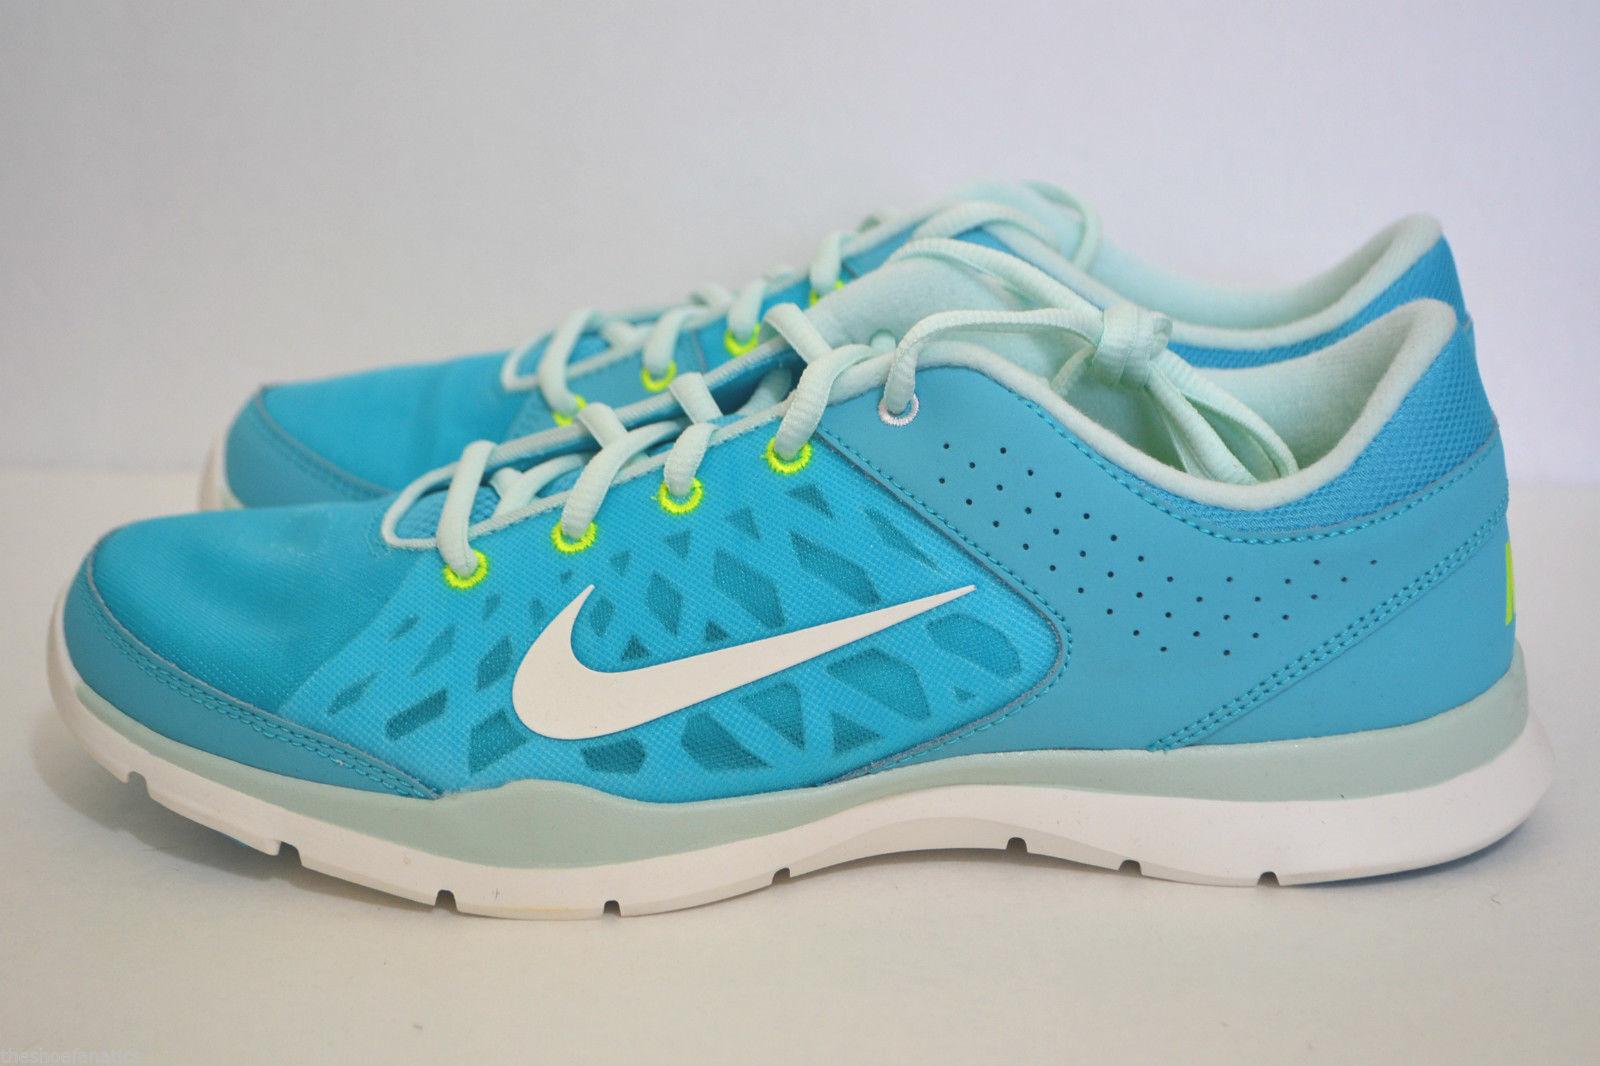 Nike Wmns Flex Trainer 3 Gamma Blau Trainers schuhe Größes UK- 4.5_5.5_7.5